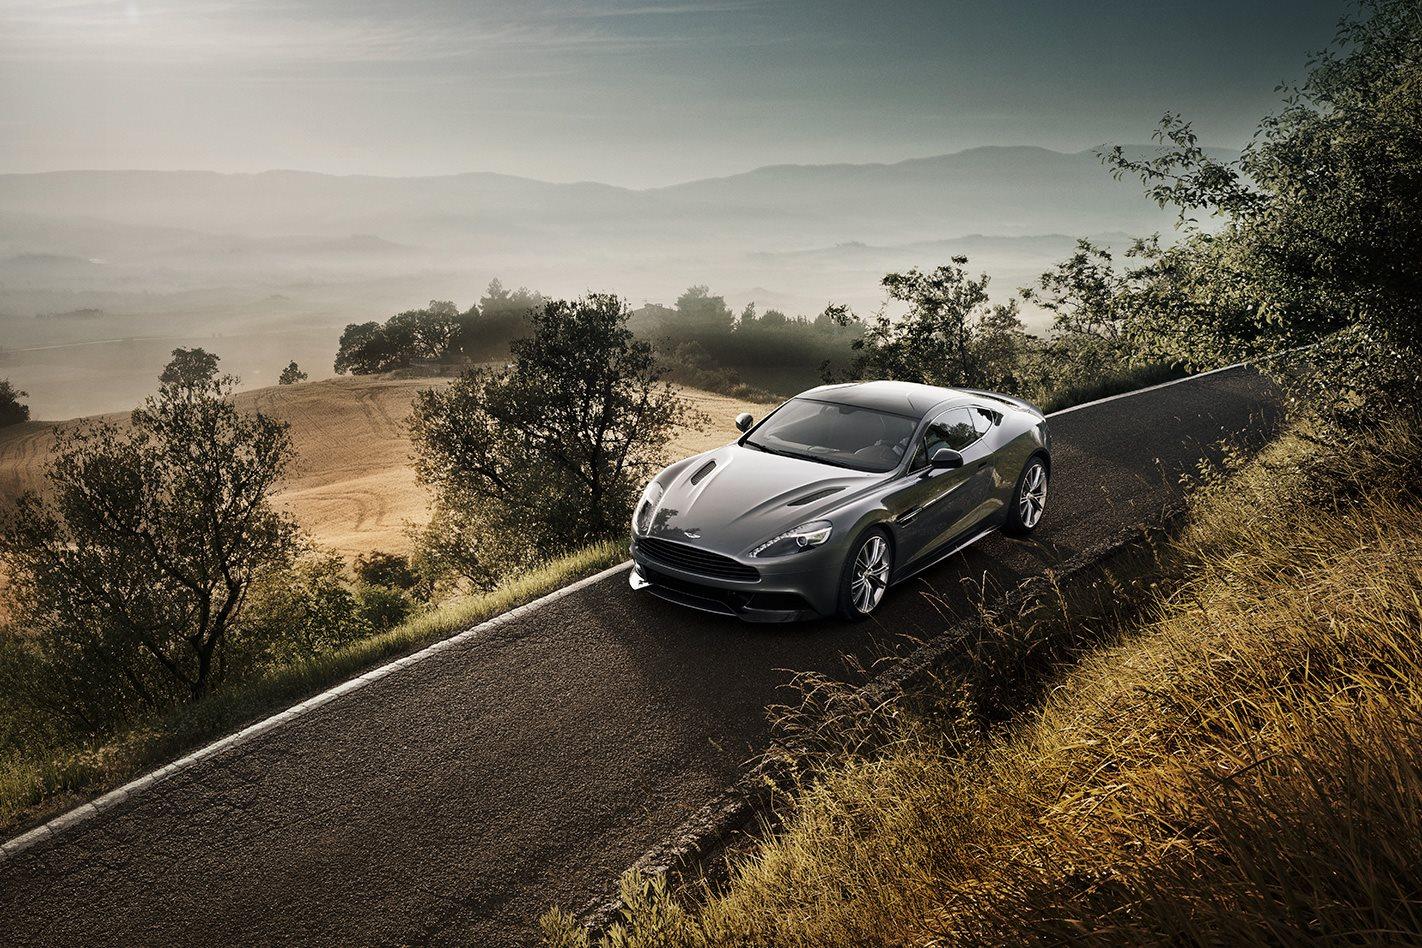 2012-Aston-Martin-Vanquish-drive.jpg